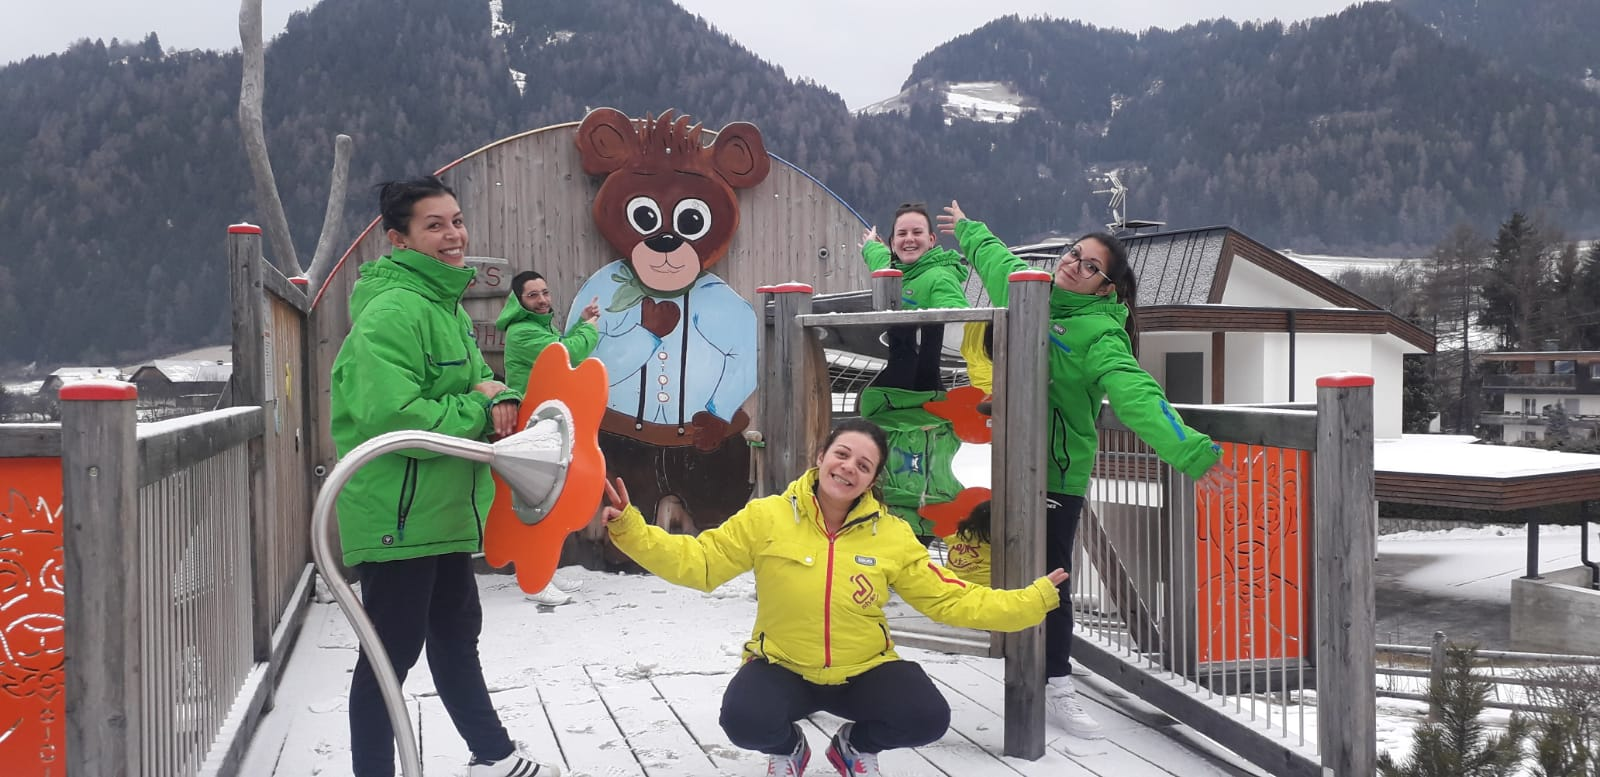 Dolomit Family Resort Garberhof